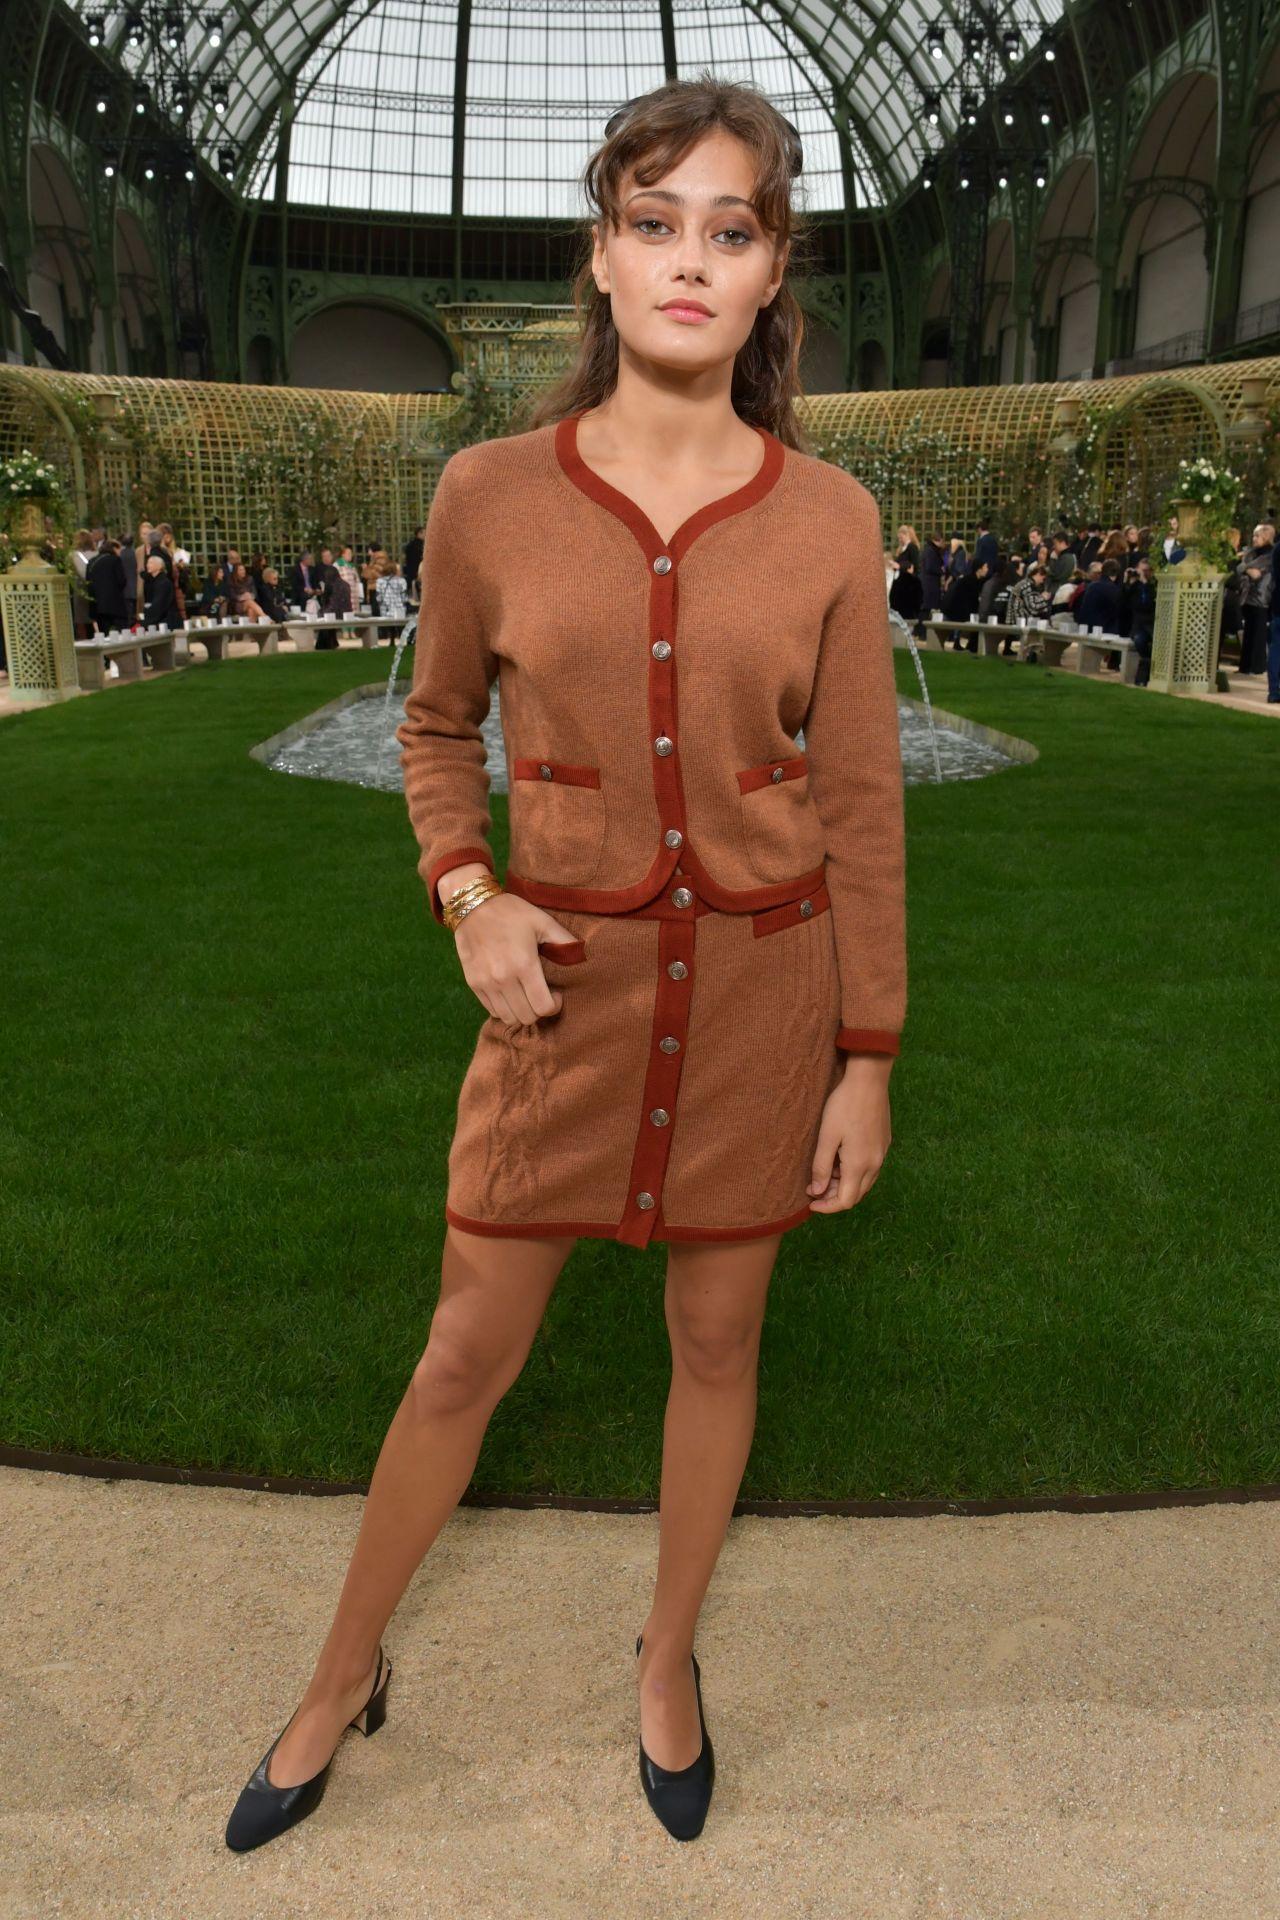 Olga Tretjacenko legs | Naked body parts of celebrities